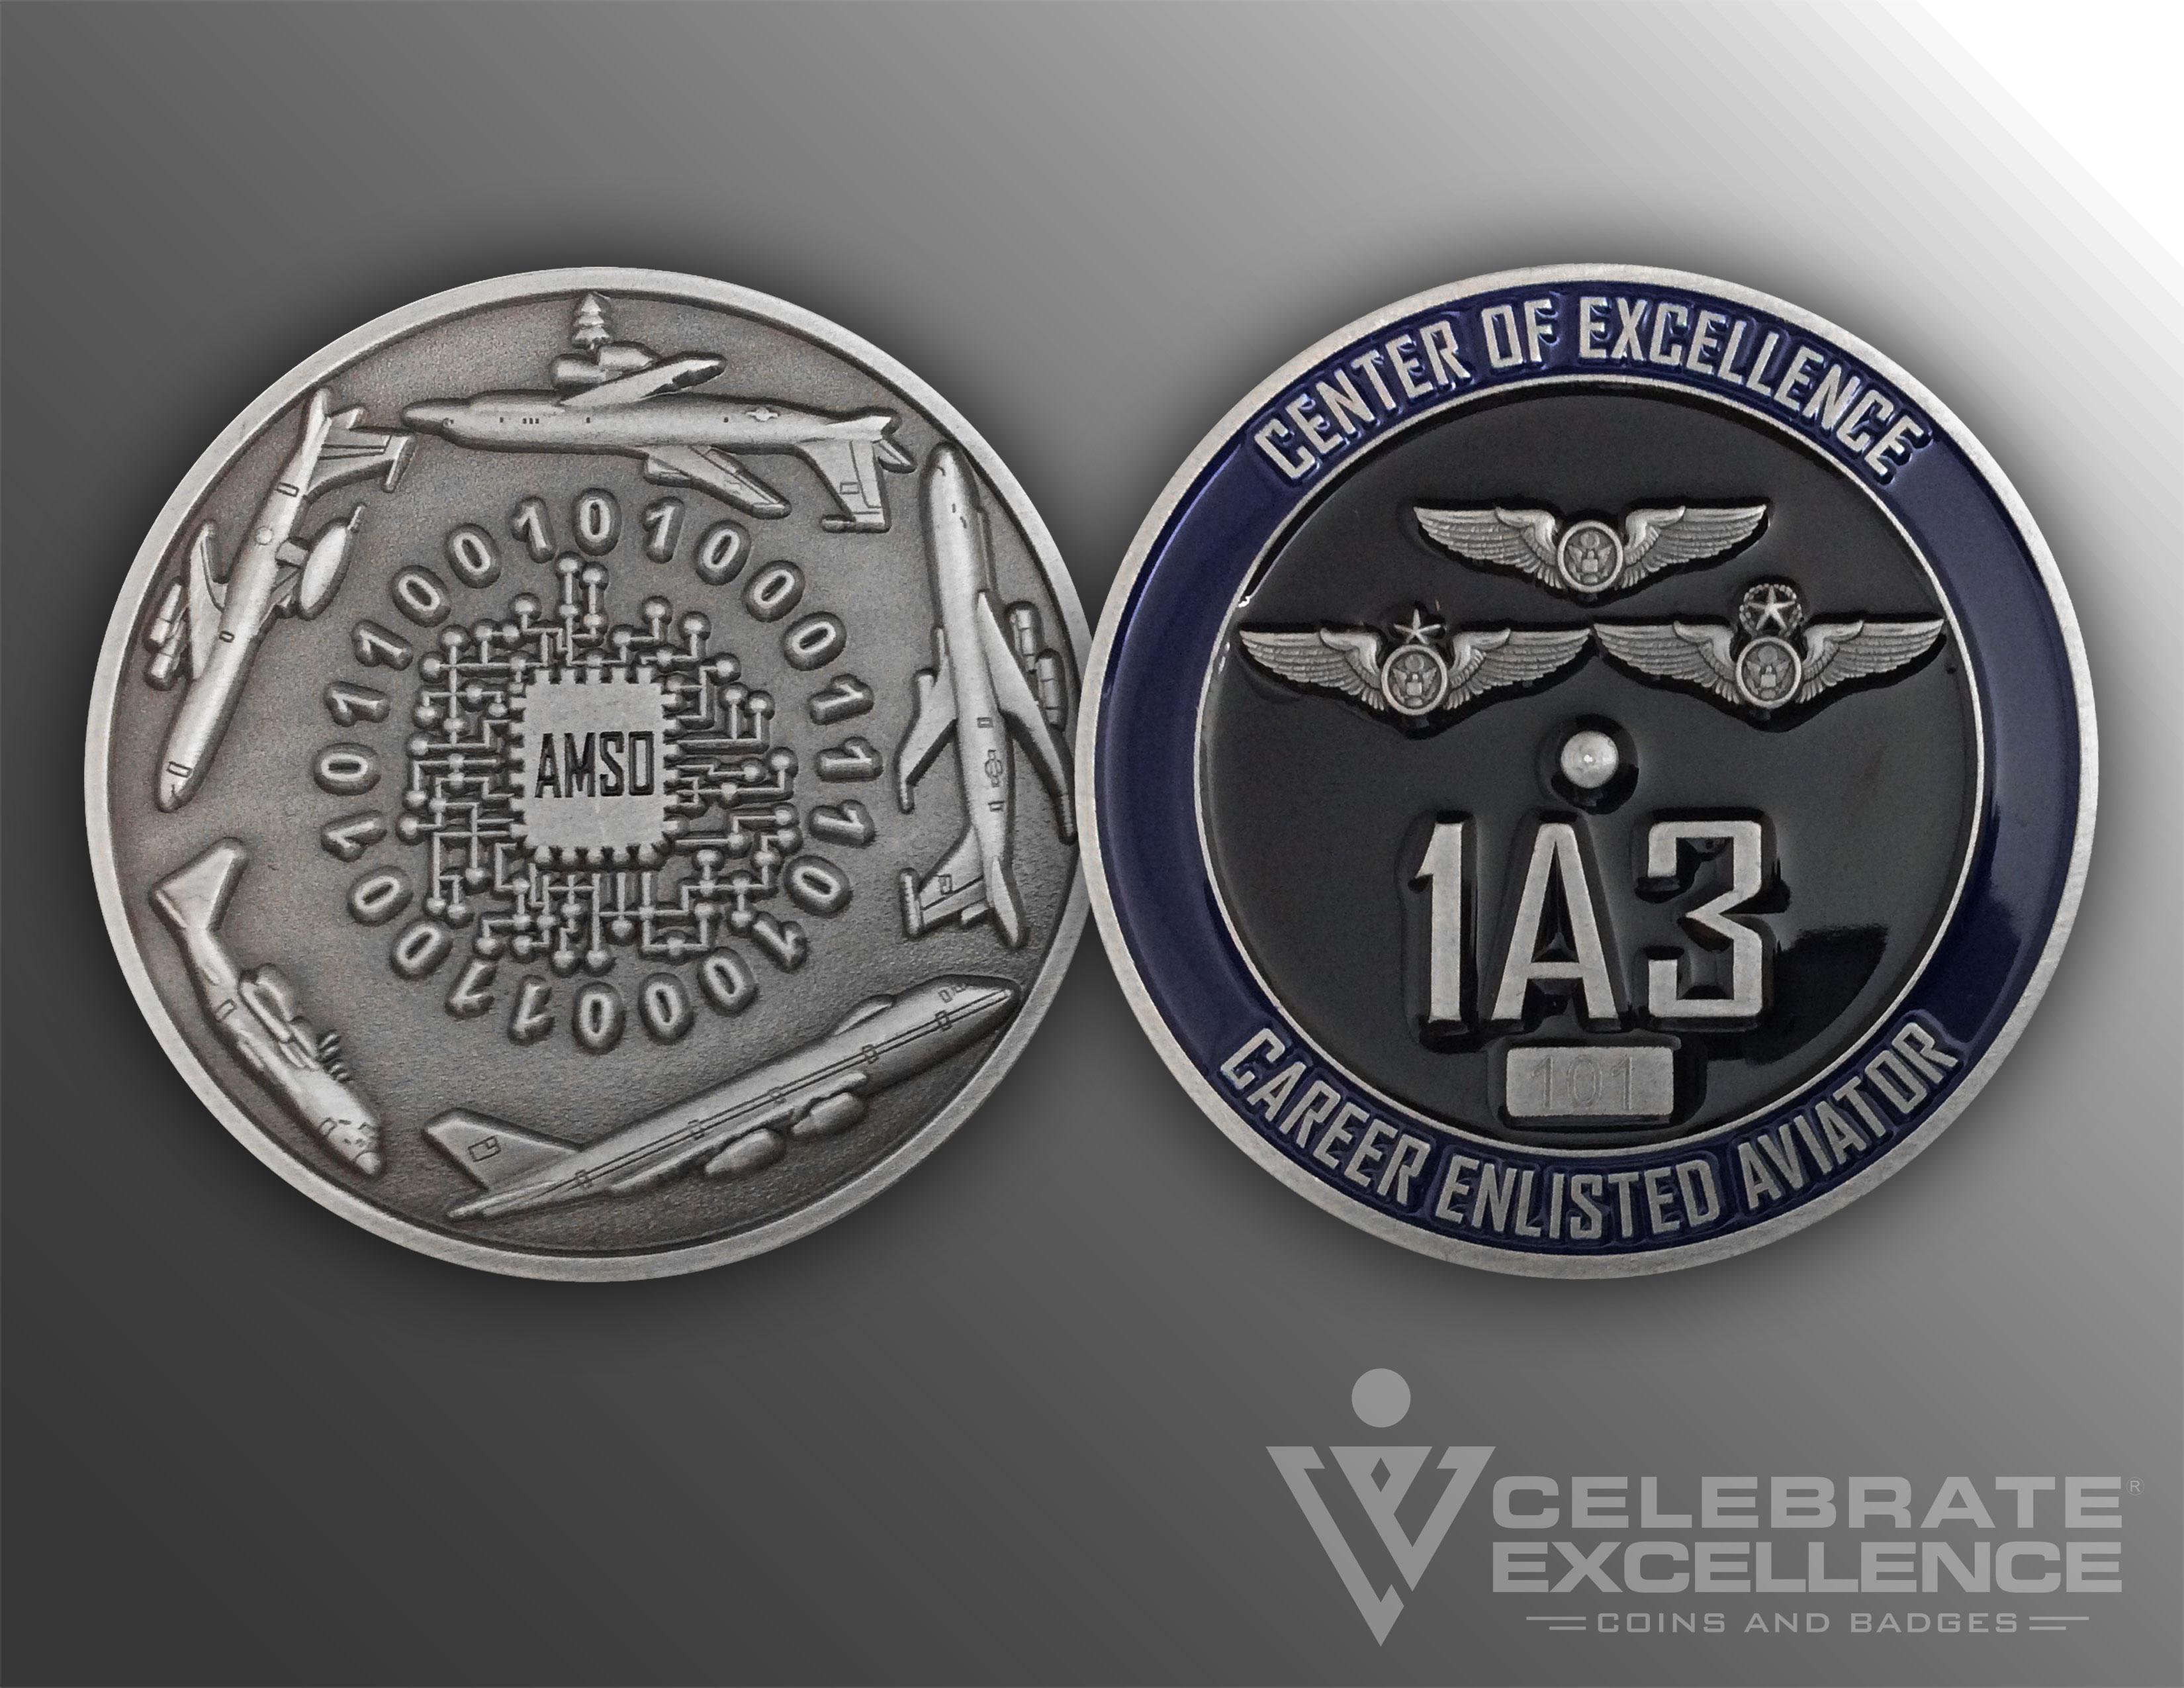 Career-Enlisted-Aviator-1A3-Coin